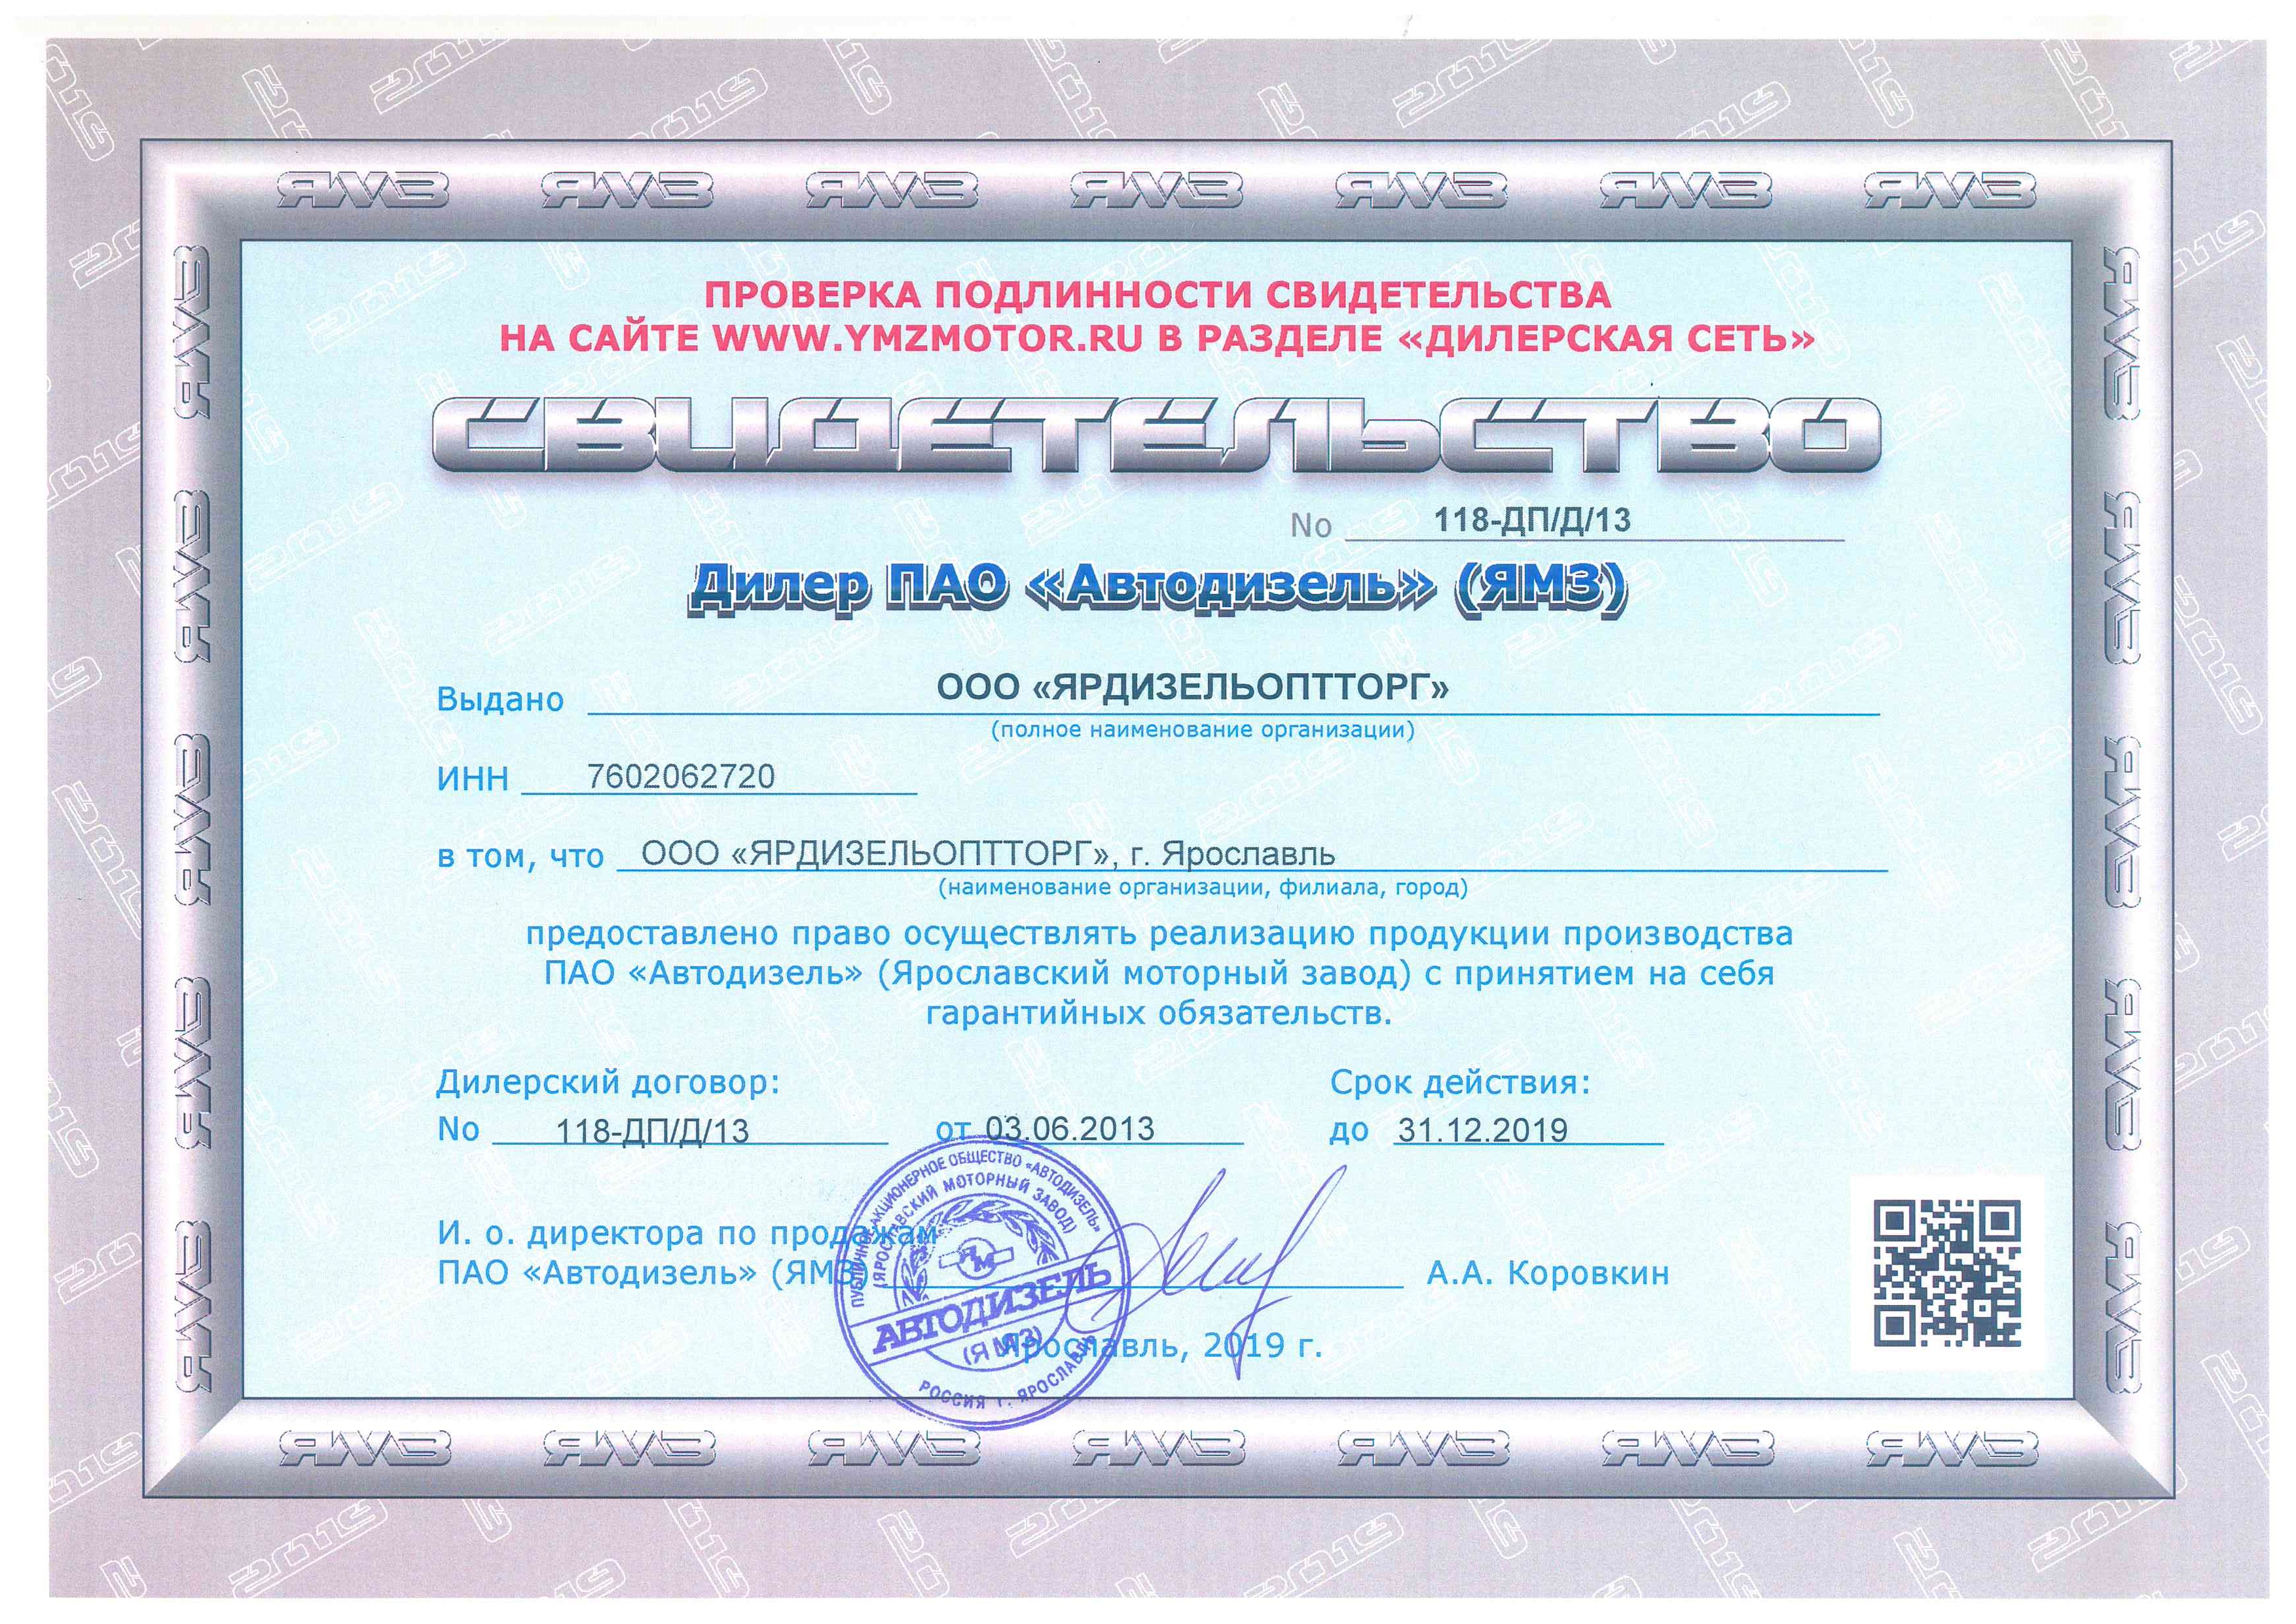 https://ymzdiesel.ru/files/sertificate/yadot_ymz_2019.jpg